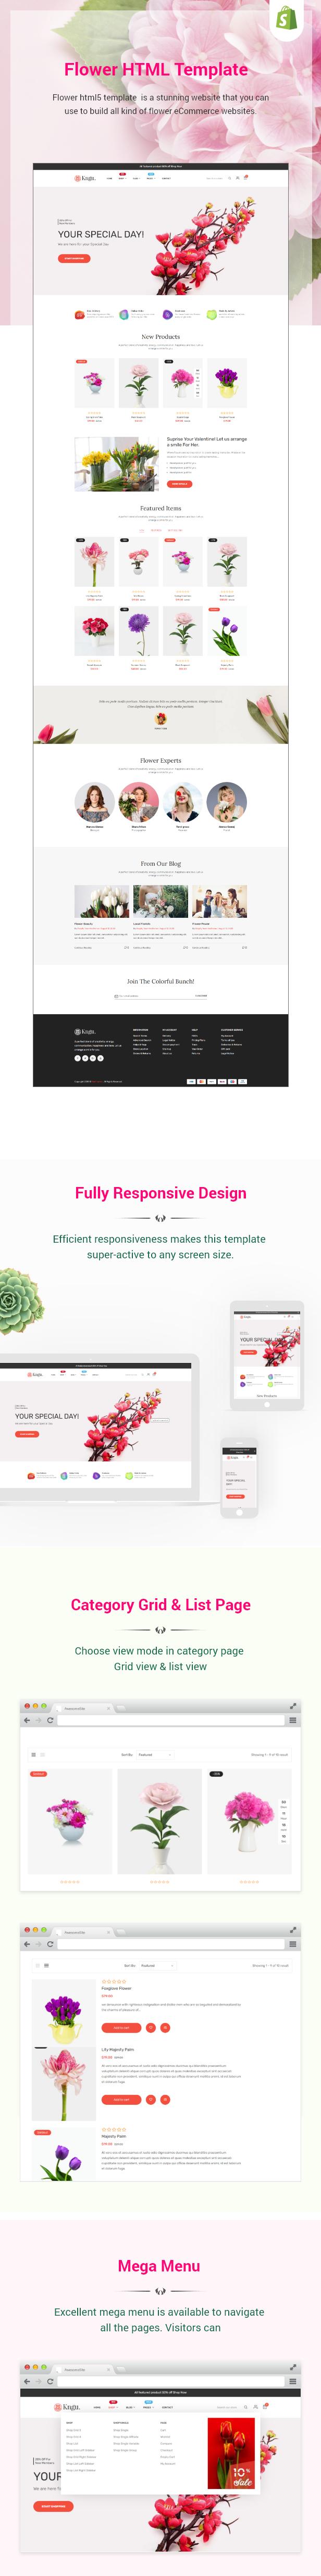 Kngu - Flower HTML Bootstrap 5 Template - 1